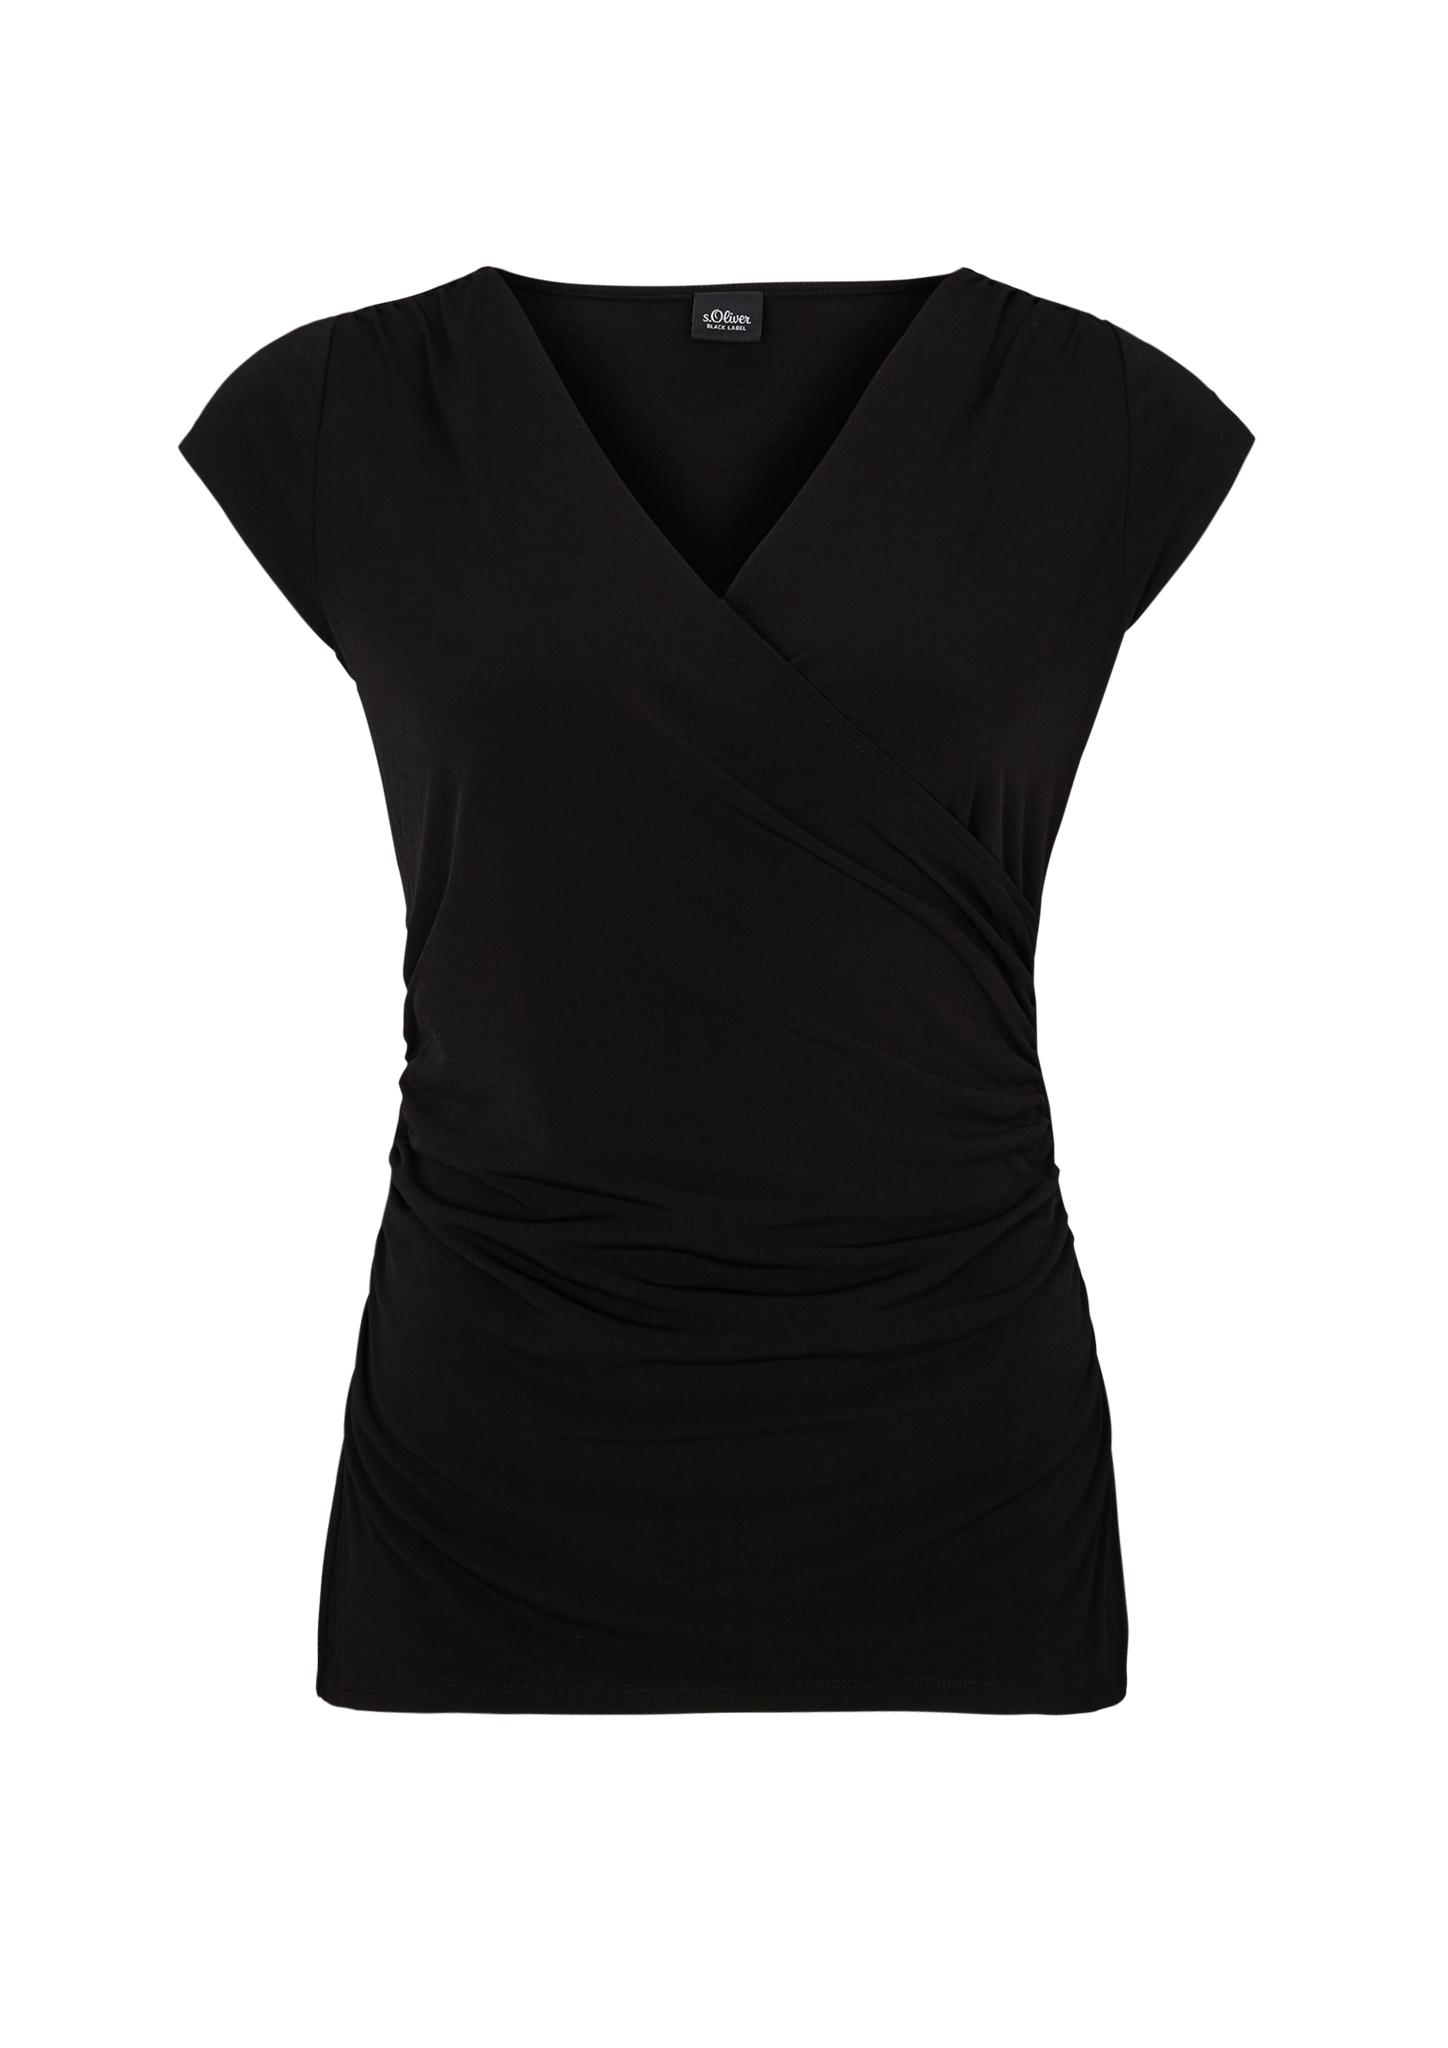 Wickelshirt | Bekleidung > Shirts > Wickelshirts | Schwarz | 95% polyester -  5% elasthan | s.Oliver BLACK LABEL